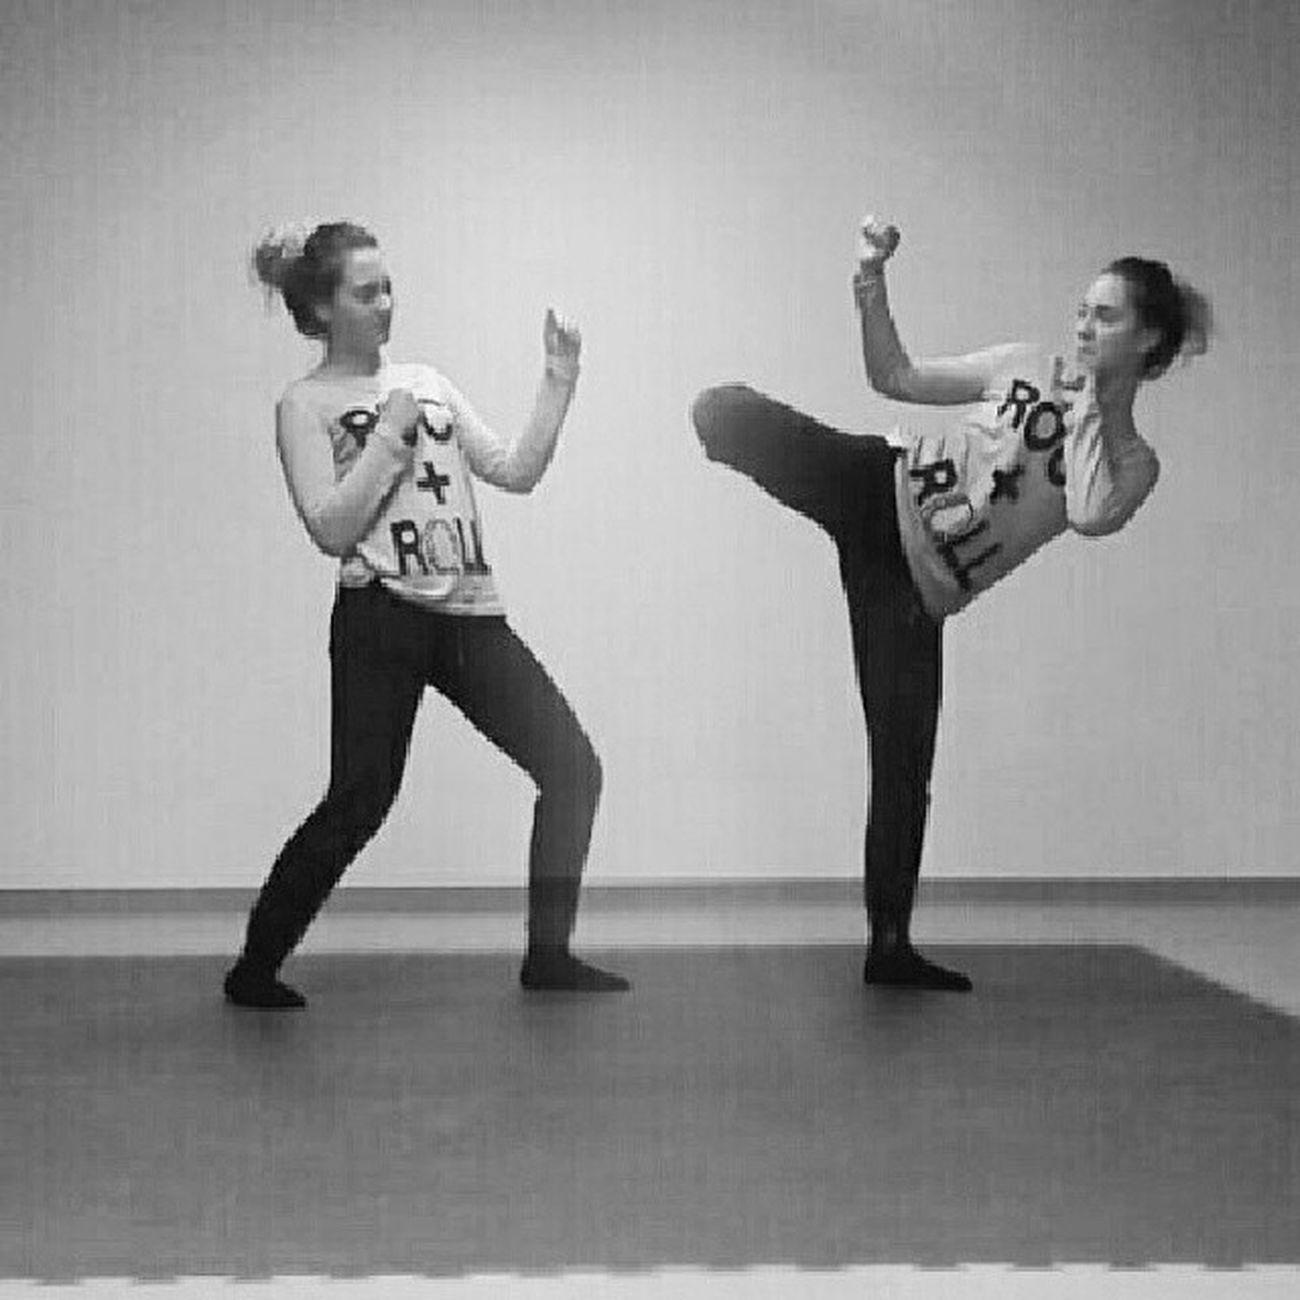 Karate Karategirl Mawashi Ippon magarisiwkffijlkambonacisi